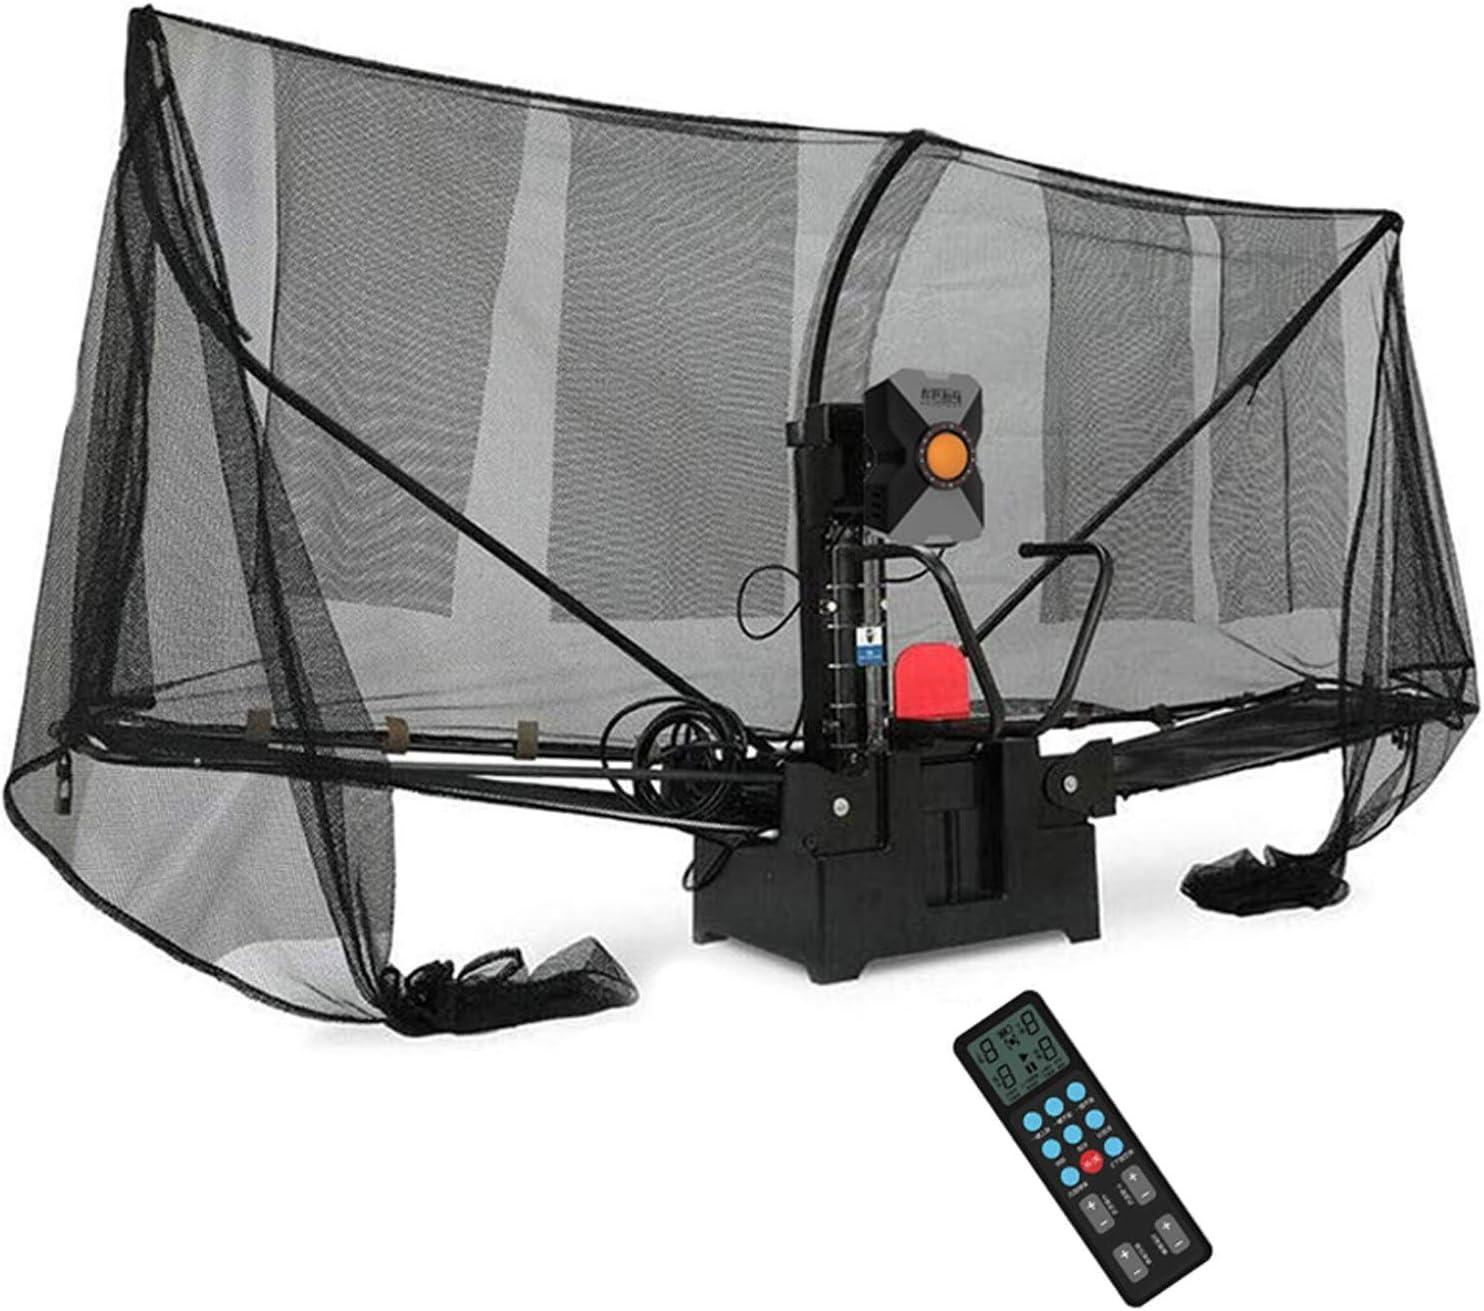 Stoge Robot De Tenis De Mesa Portátil con Red, Máquina Automática De Pelotas De Ping-Pong Máquina De Tenis De Mesa para Entrenamiento, Pelotas De Tenis De Mesa De 40mm O 40mm+.